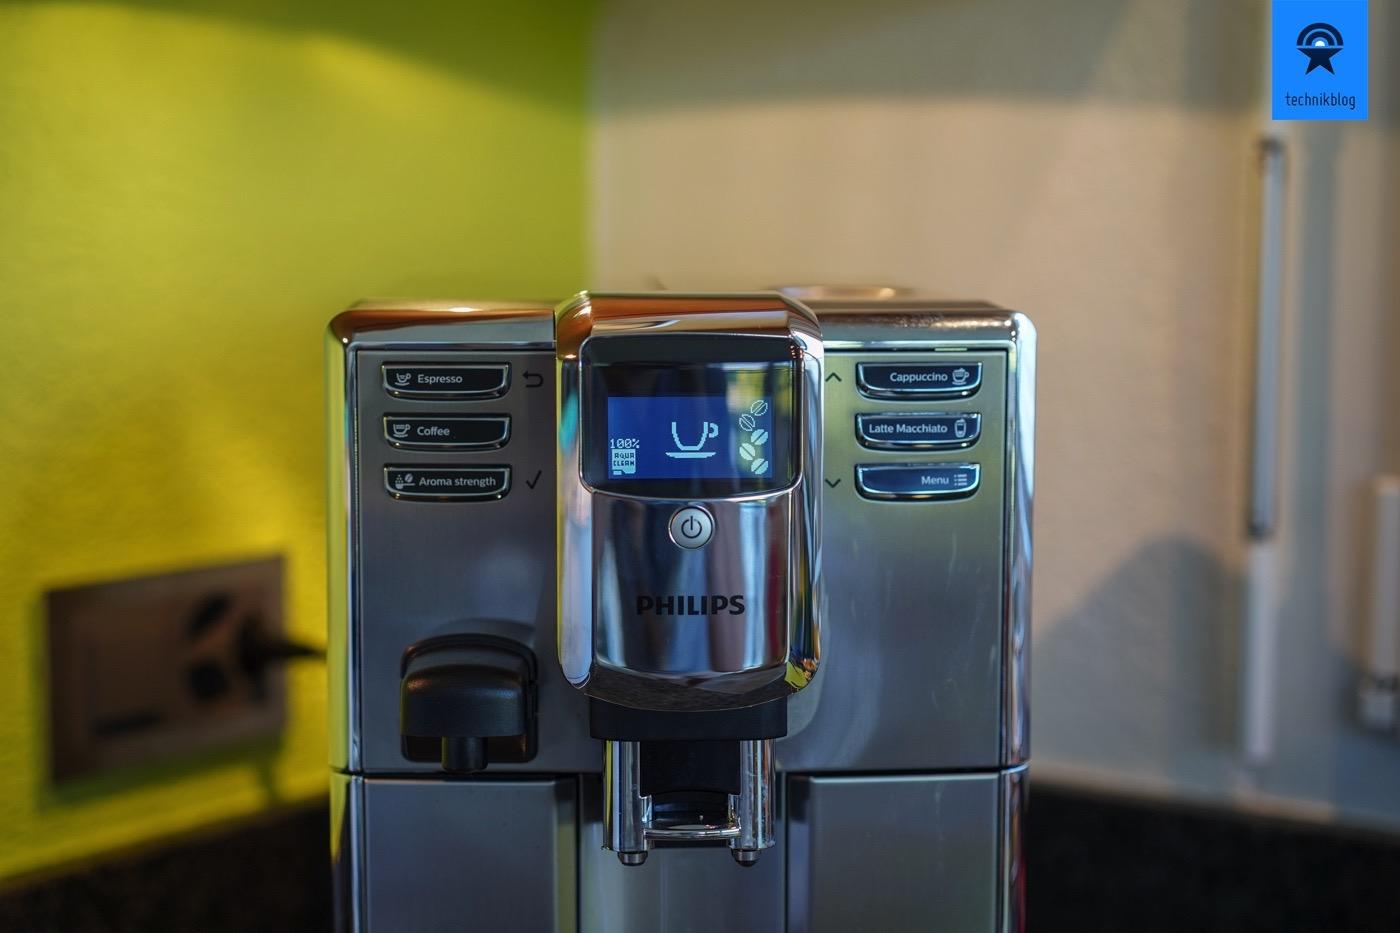 Philips EP5365/10 Kaffeevollautomat - Bedienung